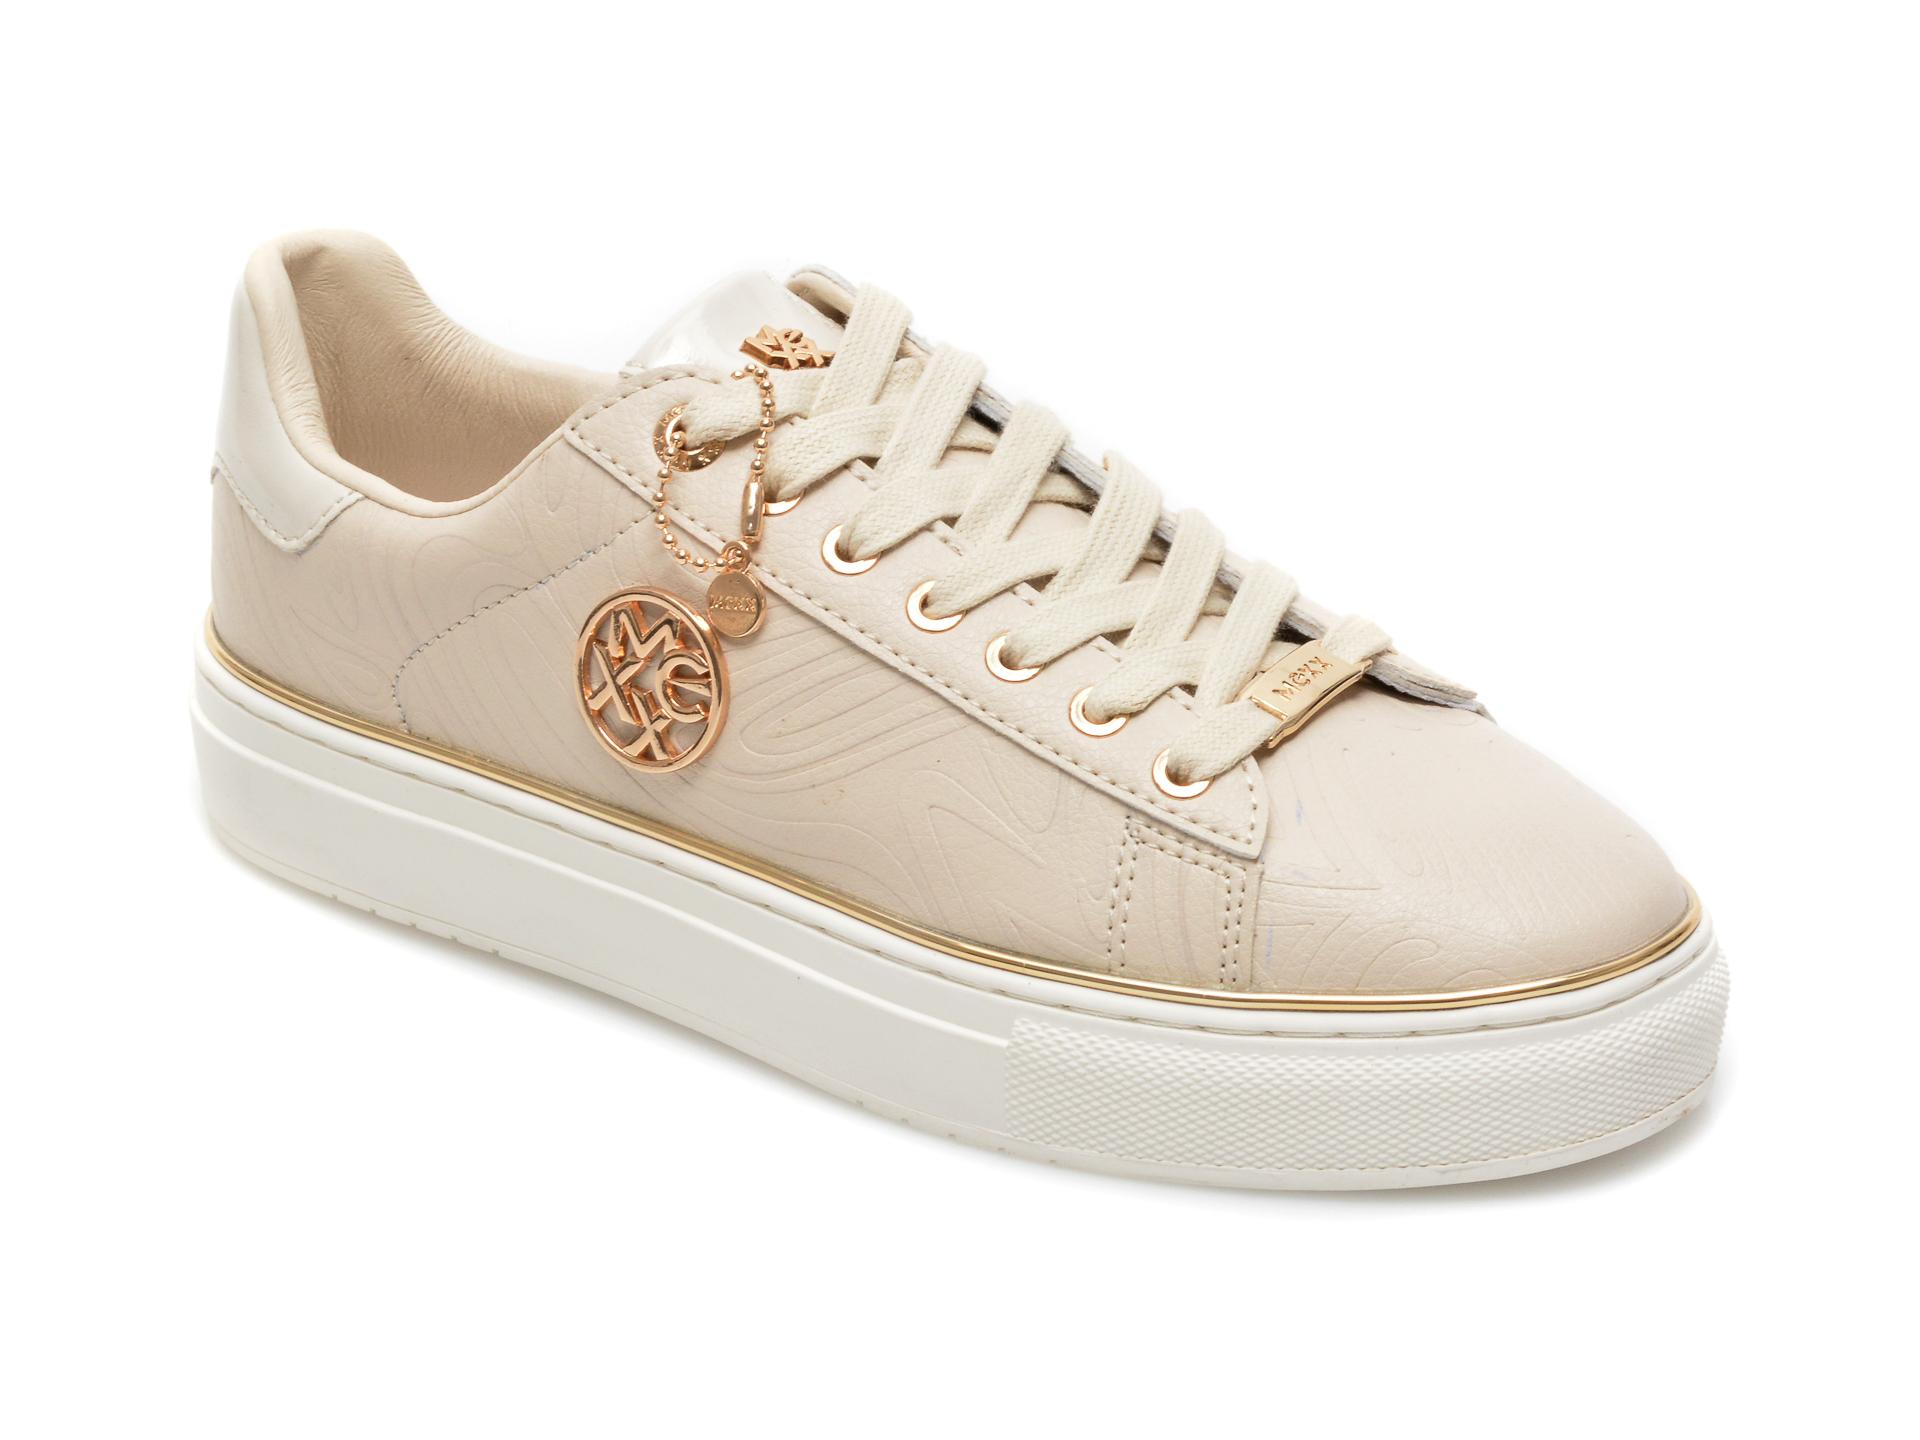 Pantofi sport MEXX bej, QP0319, din piele ecologica